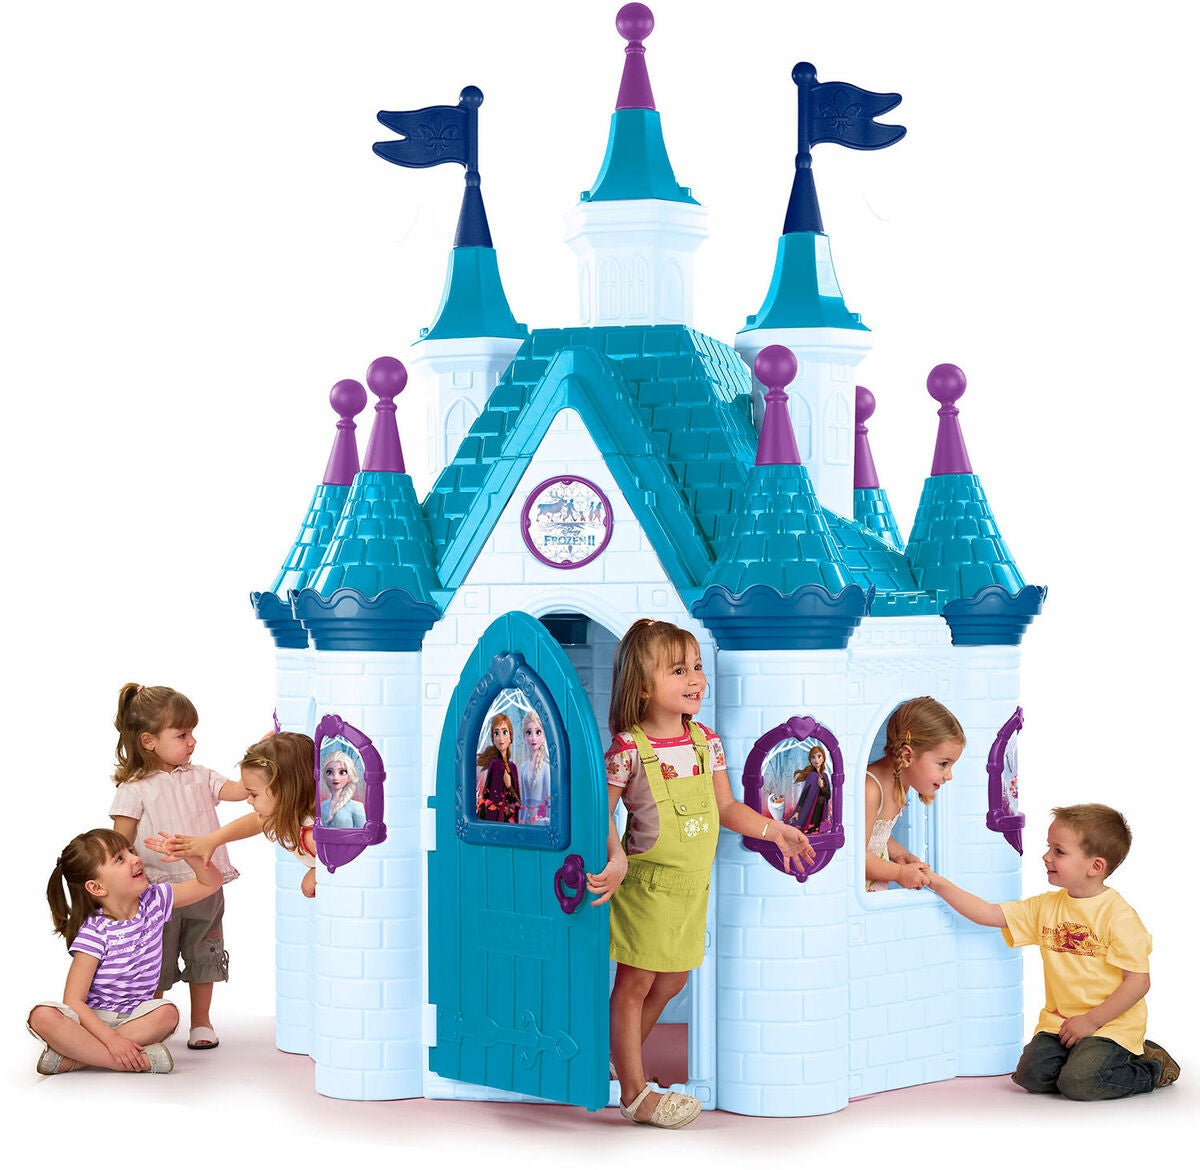 FEBER Legehus Disney Frozen 2 Arendele - Disney Frost legehus